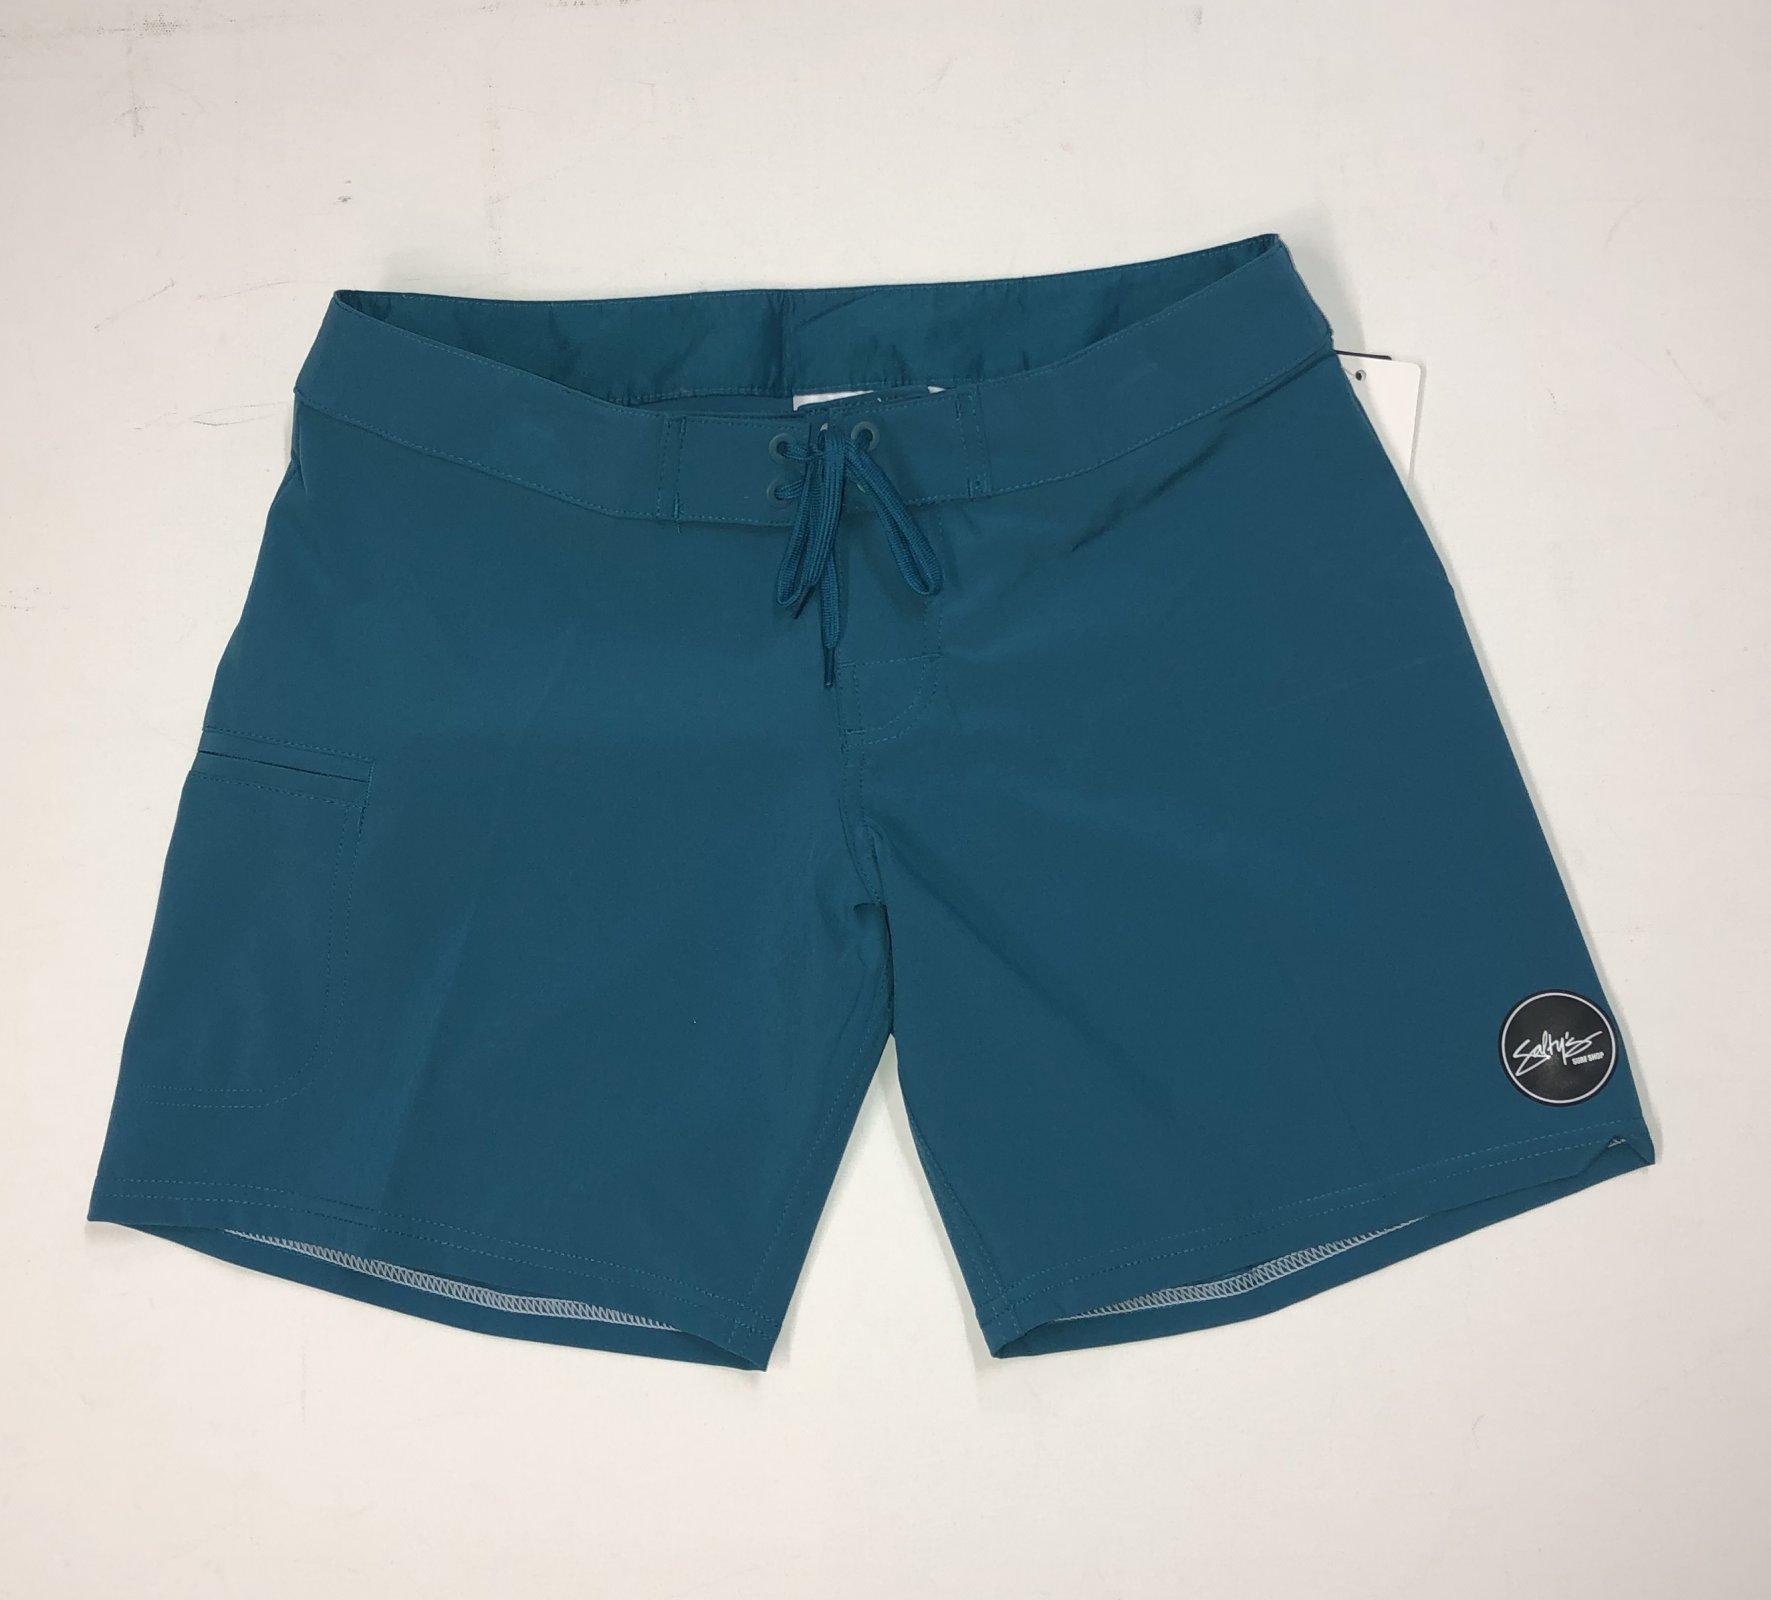 Salty's Brand Levitate Boardshort - Blue